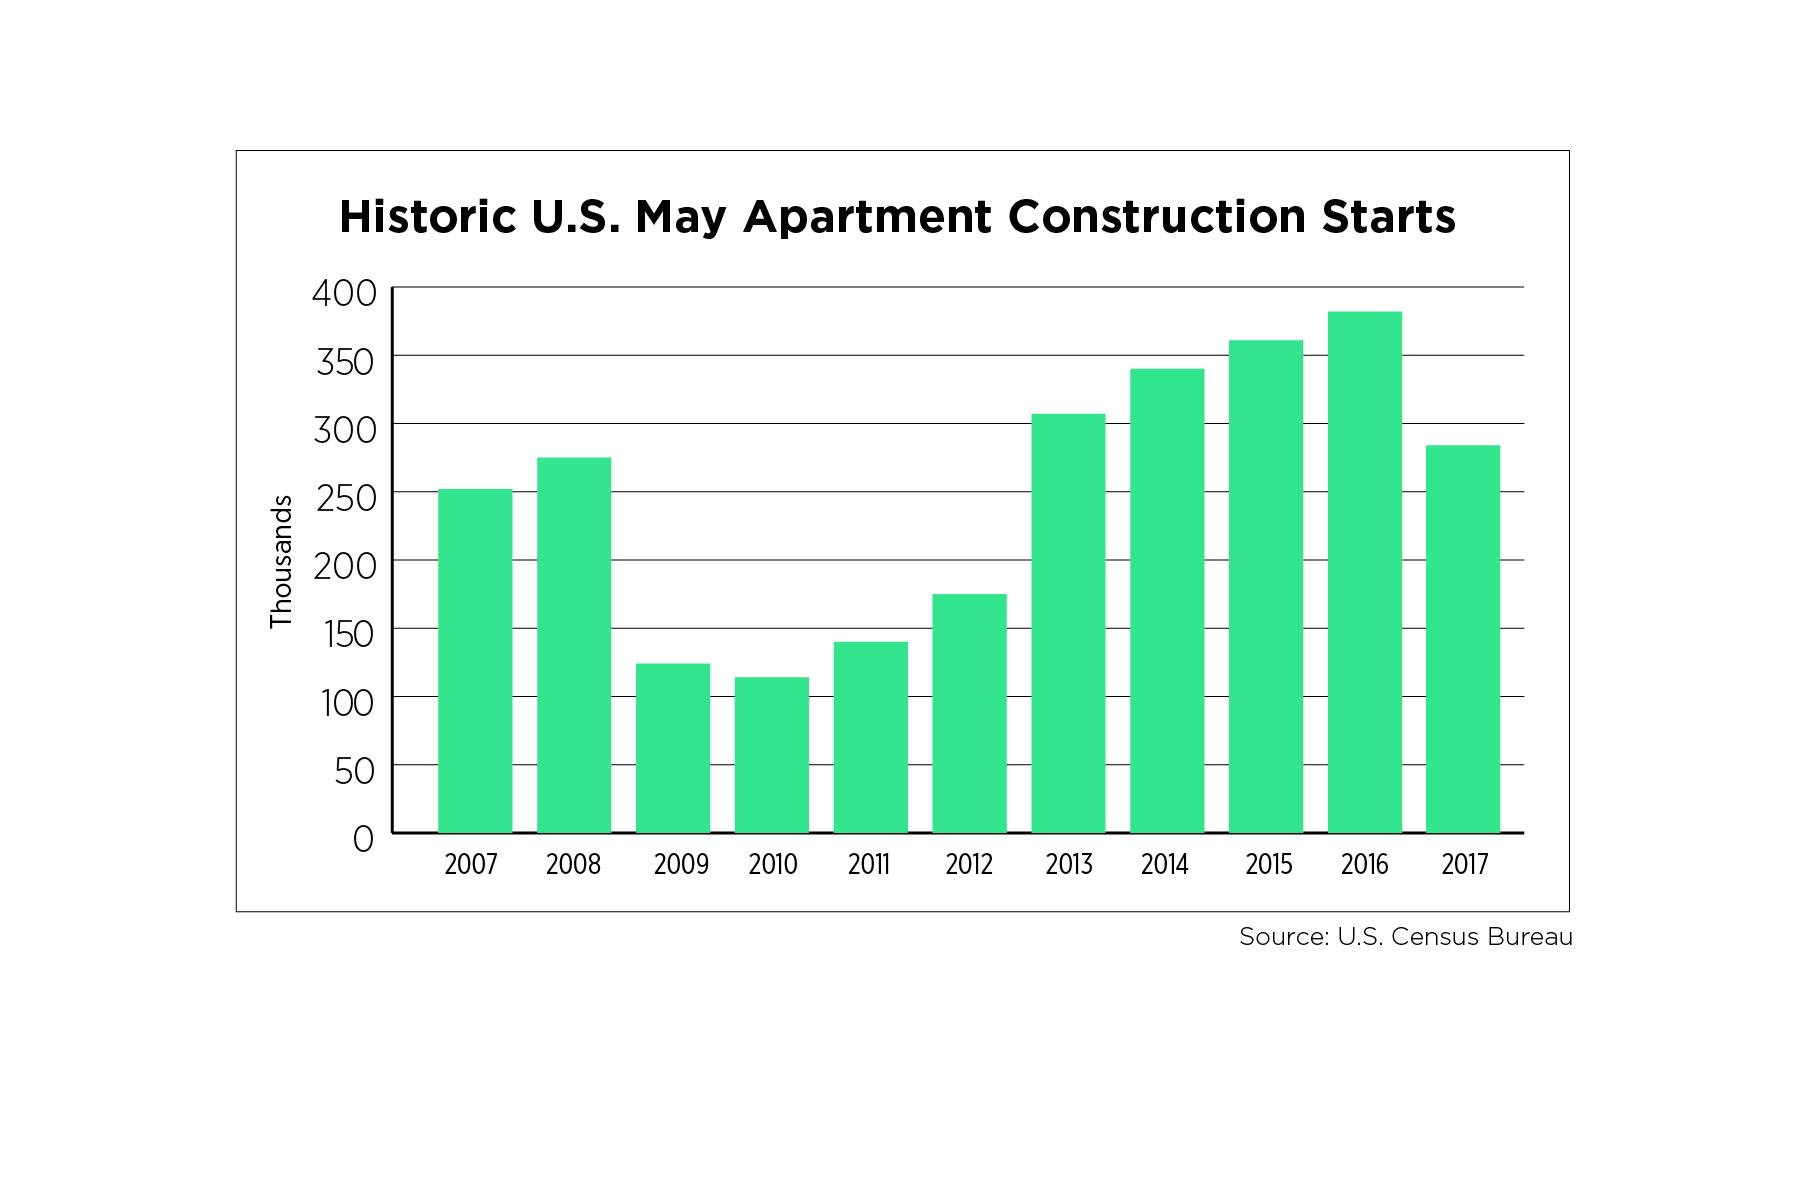 Historic US May Apartment Construction Starts